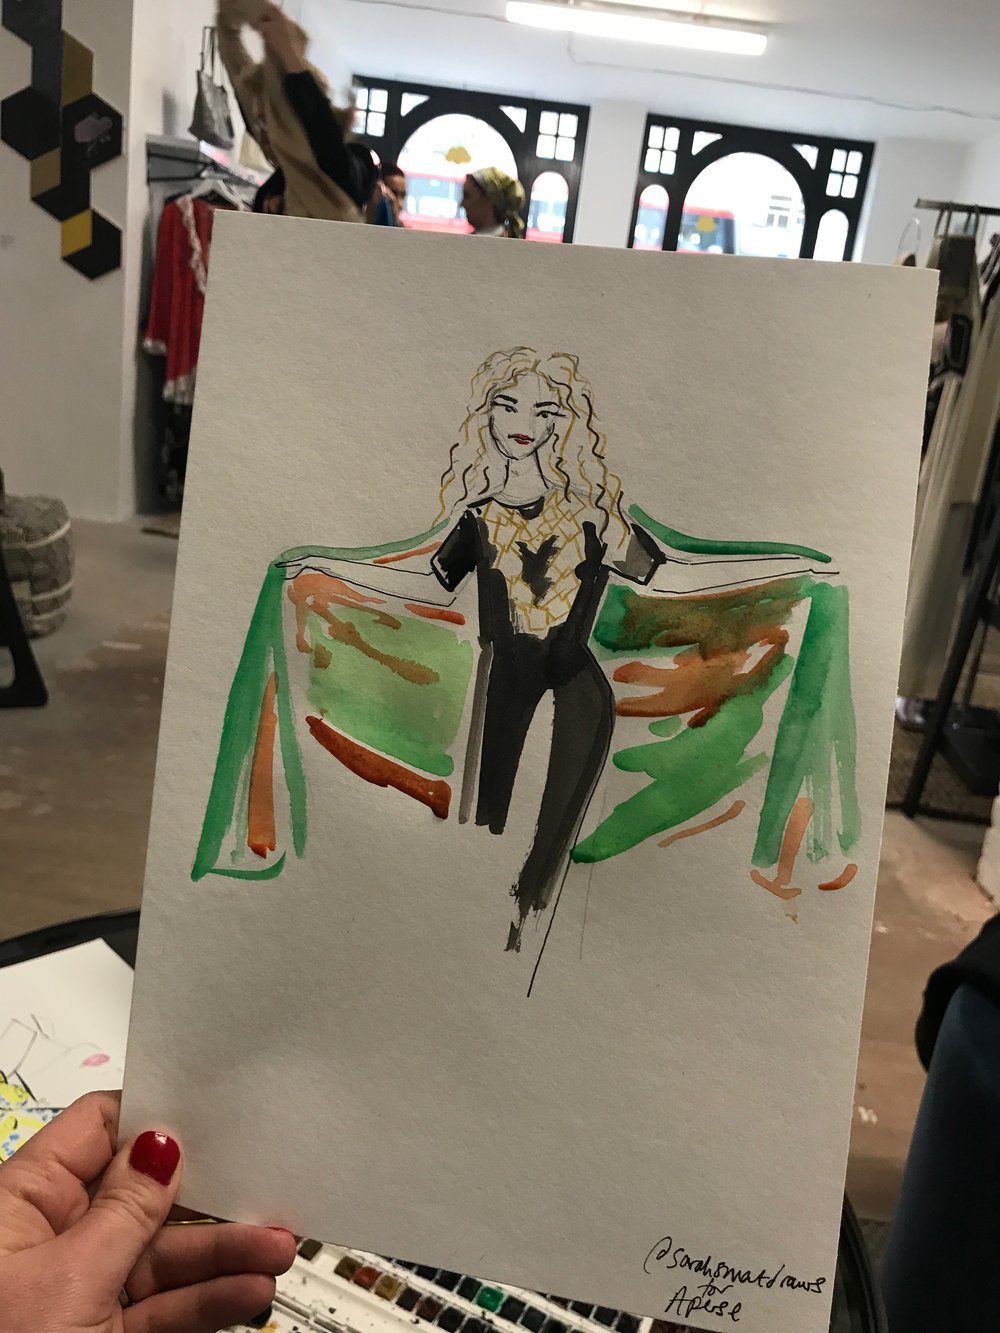 Live Fashion Illustration for Aperse